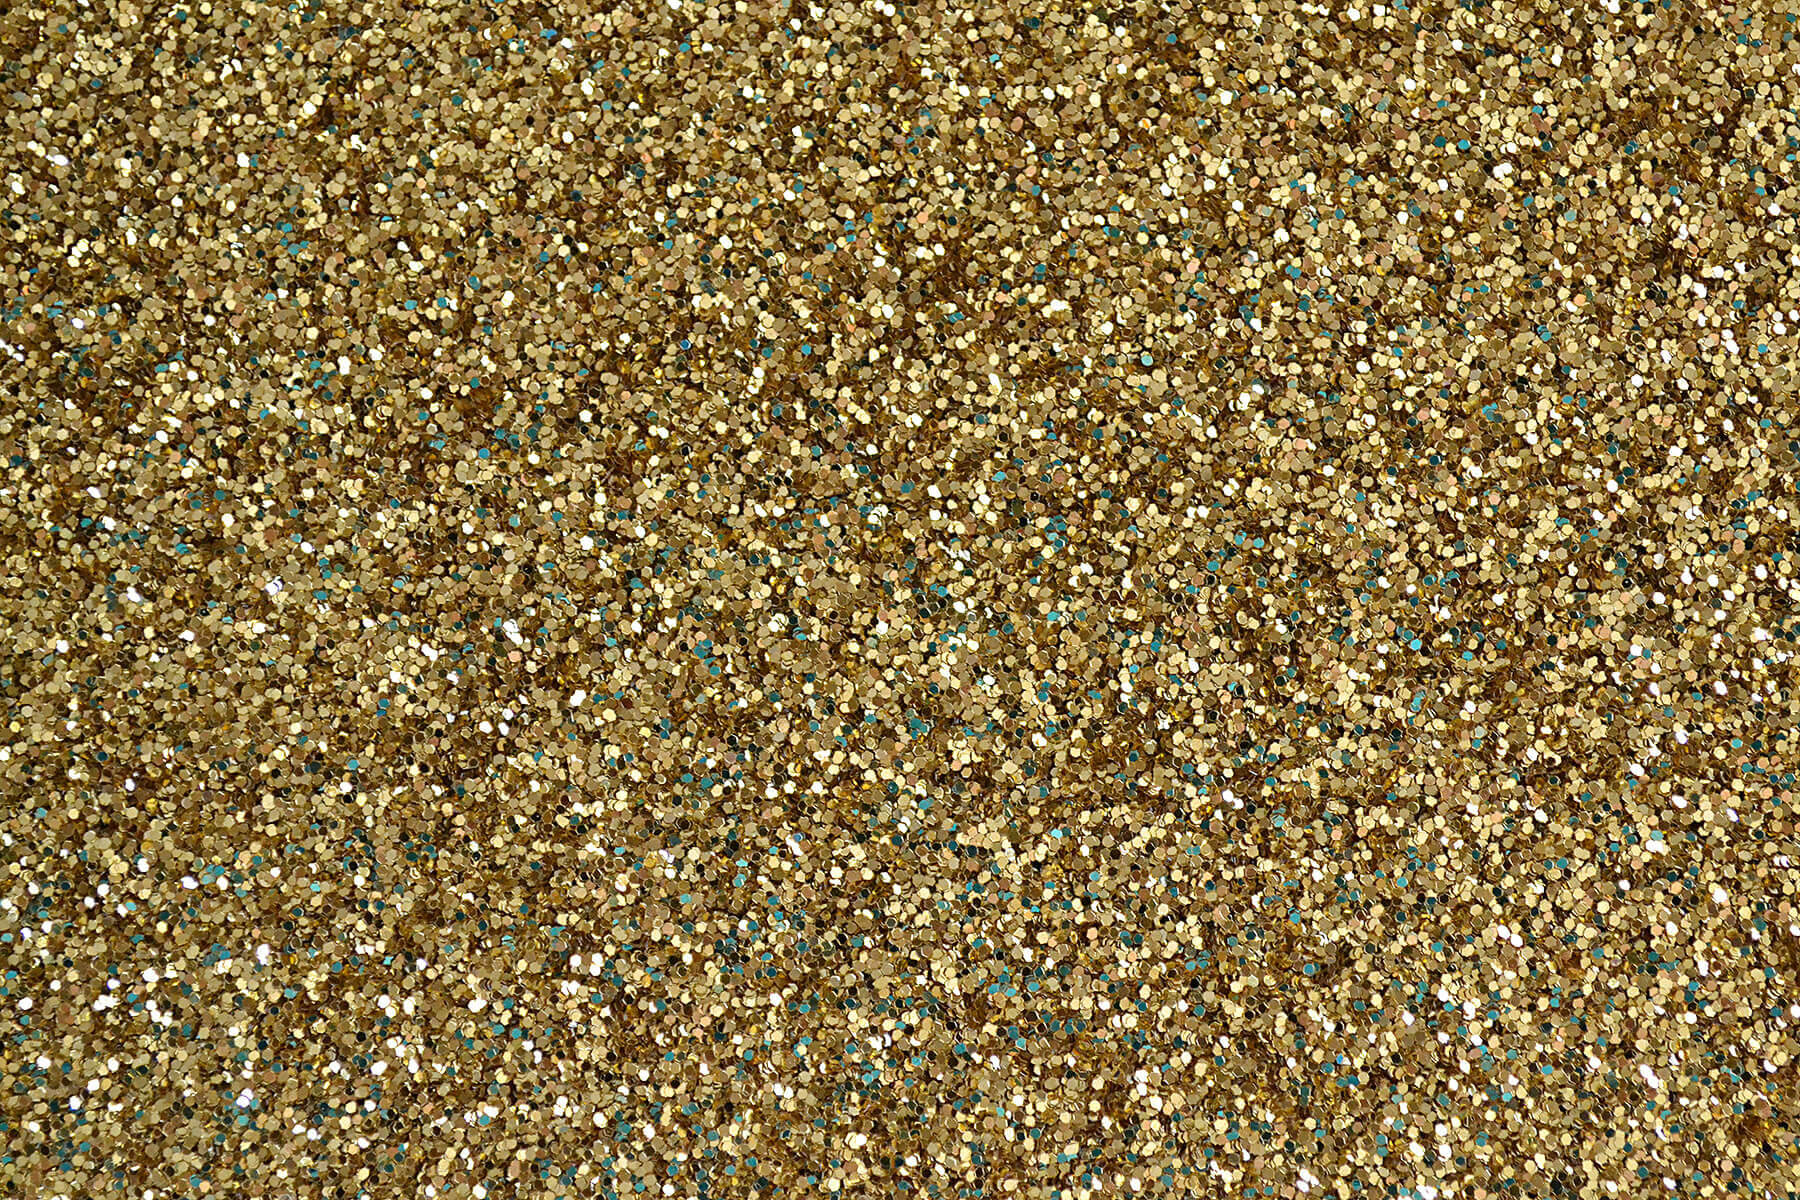 Glitter Wallpapers Gold Glitter Backgrounds Stars Backgrounds 1800x1200